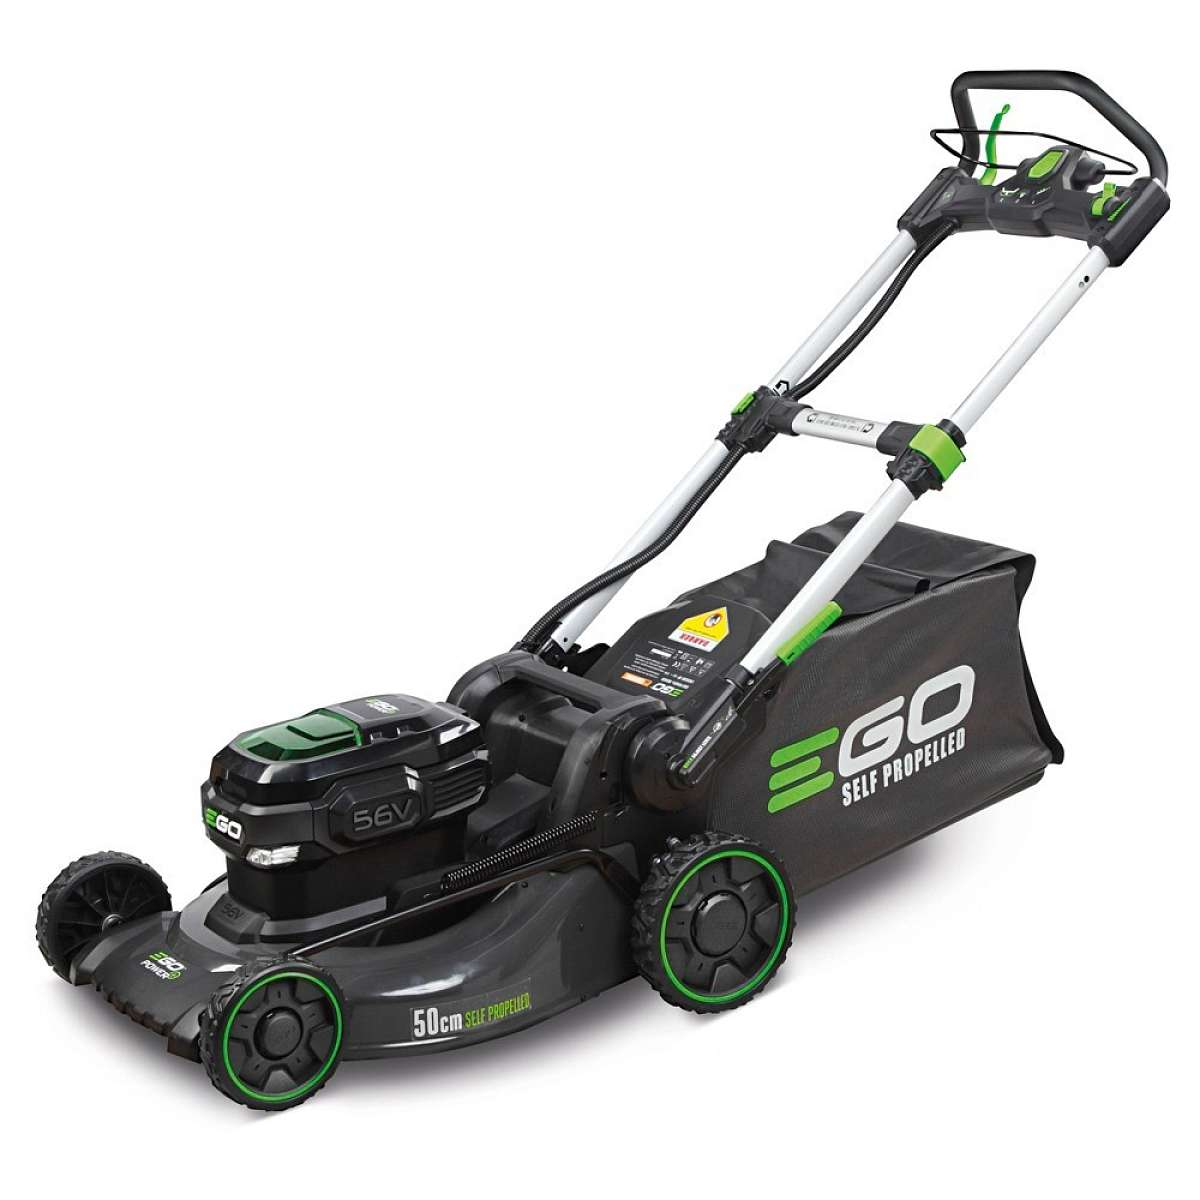 EGO LM2024E-SP  50cm zelftrekker